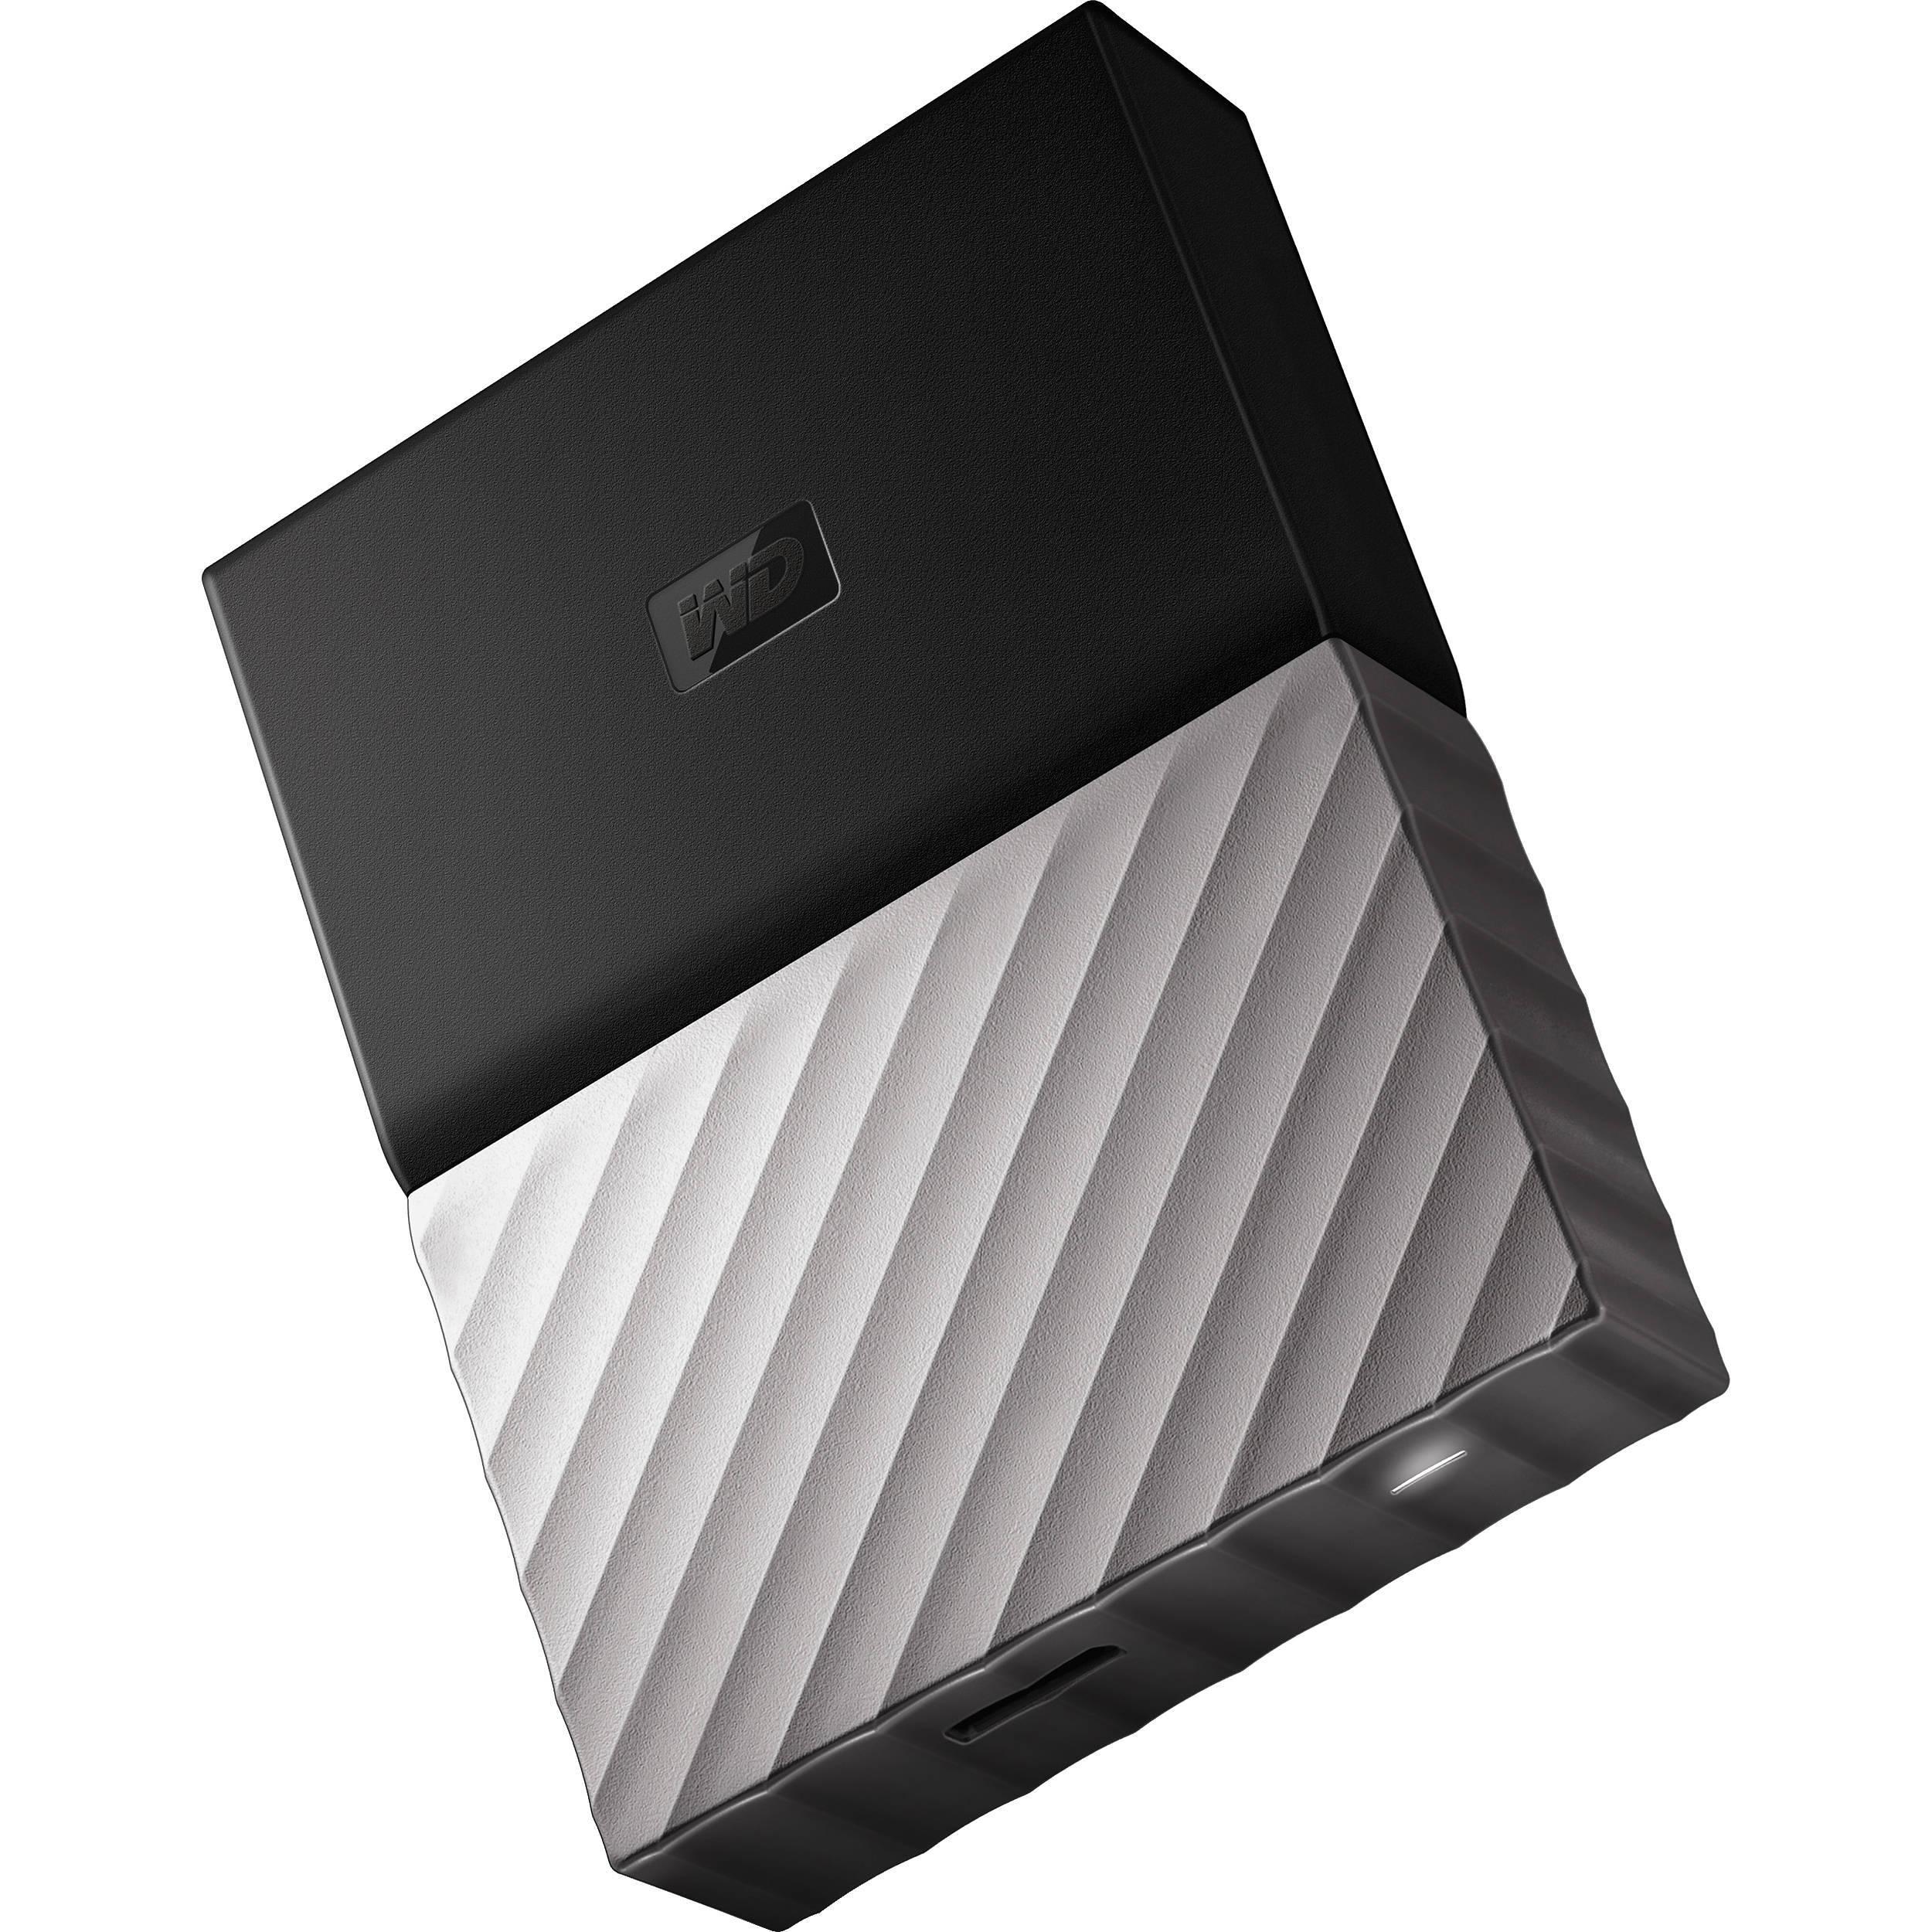 Wd My Passport Ultra Software Download Mac